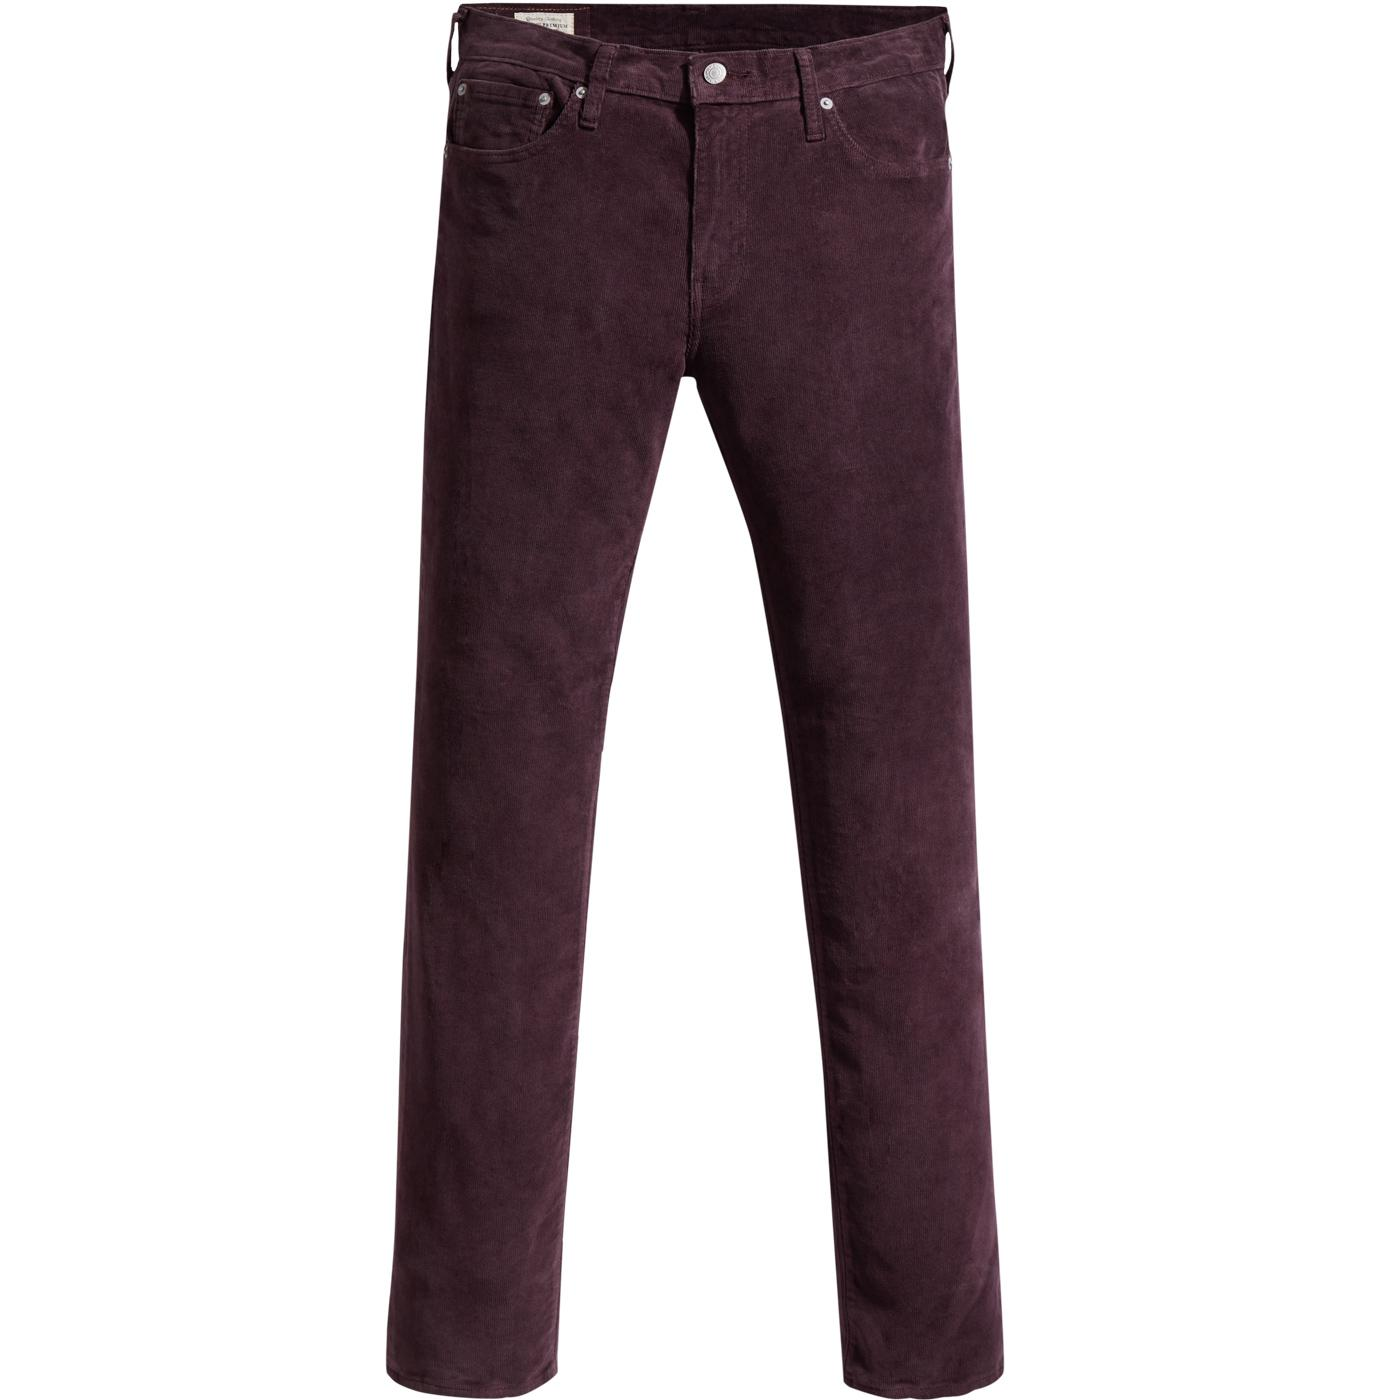 LEVI'S 511 Retro Slim 14W Cord Trousers (Bayberry)